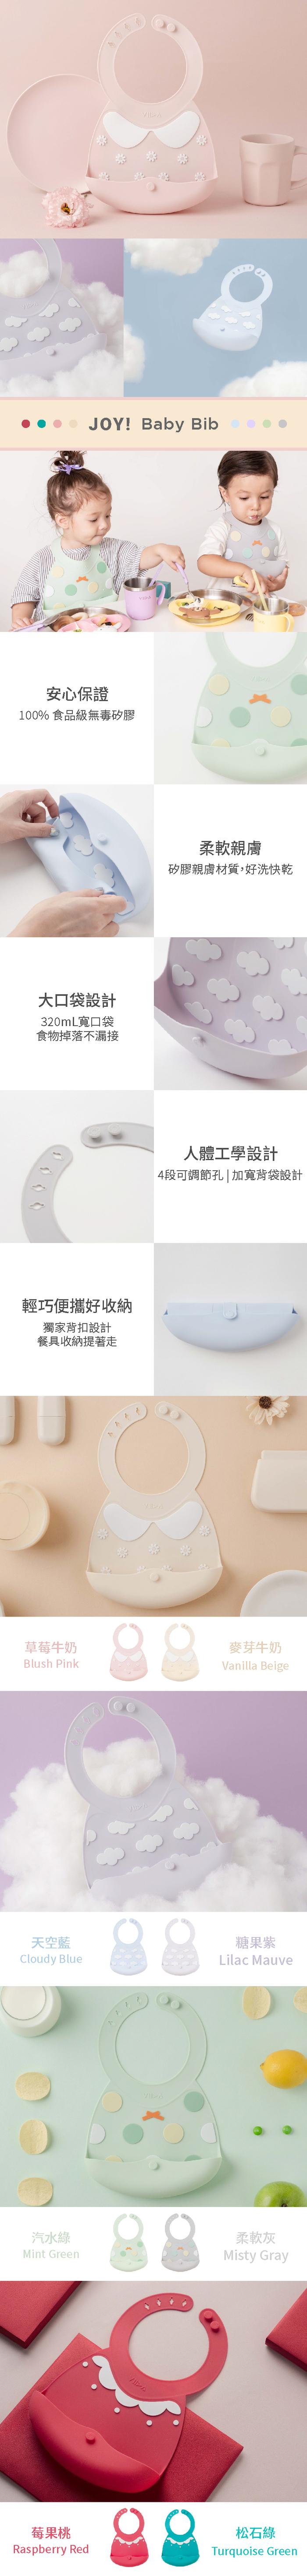 VIIDA|Joy 便攜式矽膠圍兜-療癒系